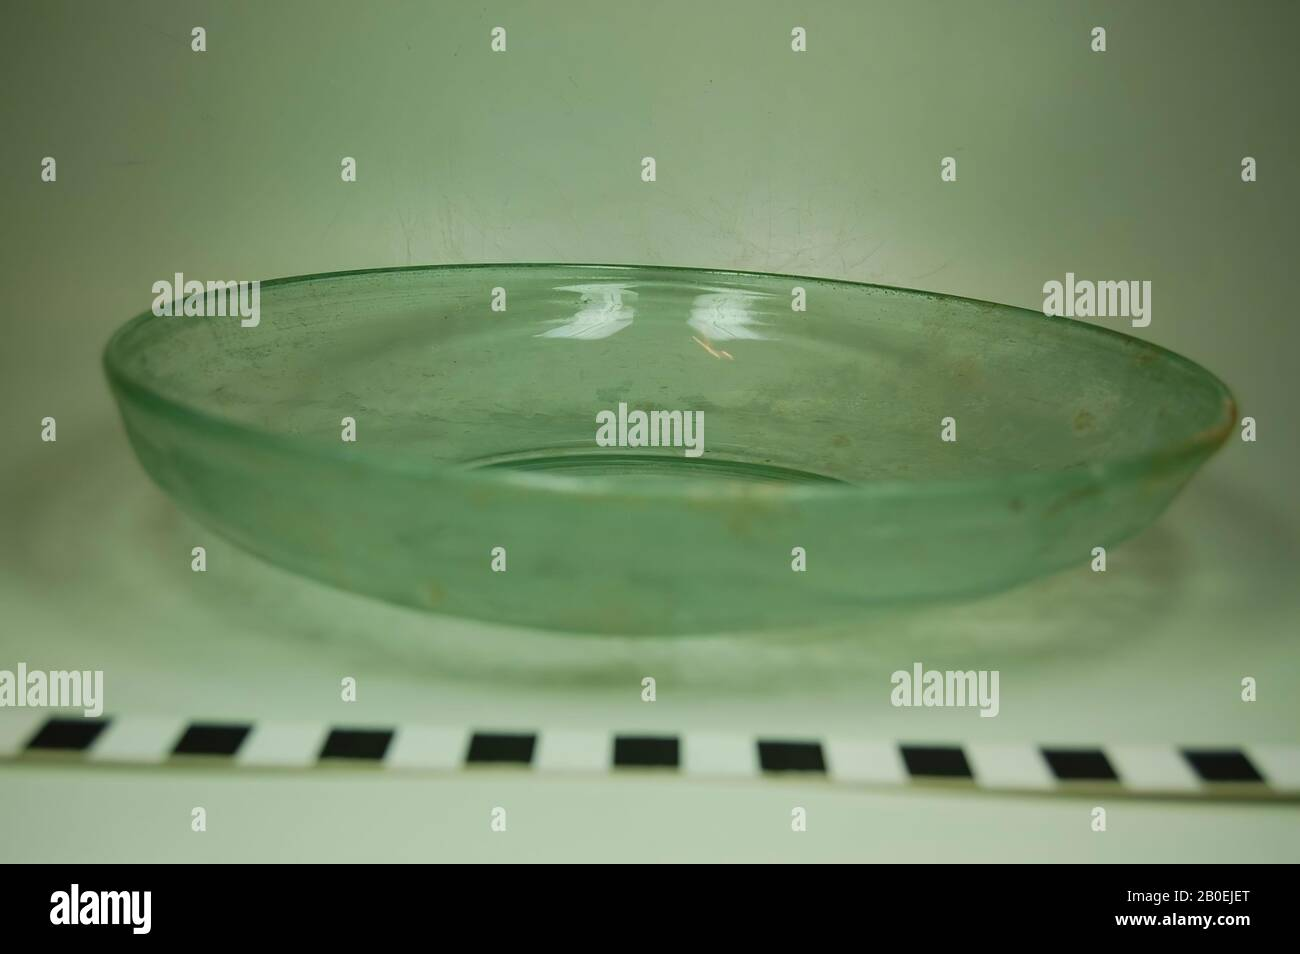 Plato de cristal verdeoso. Soplado., placa, cristal, 21 cm, ø 21 cm Foto de stock